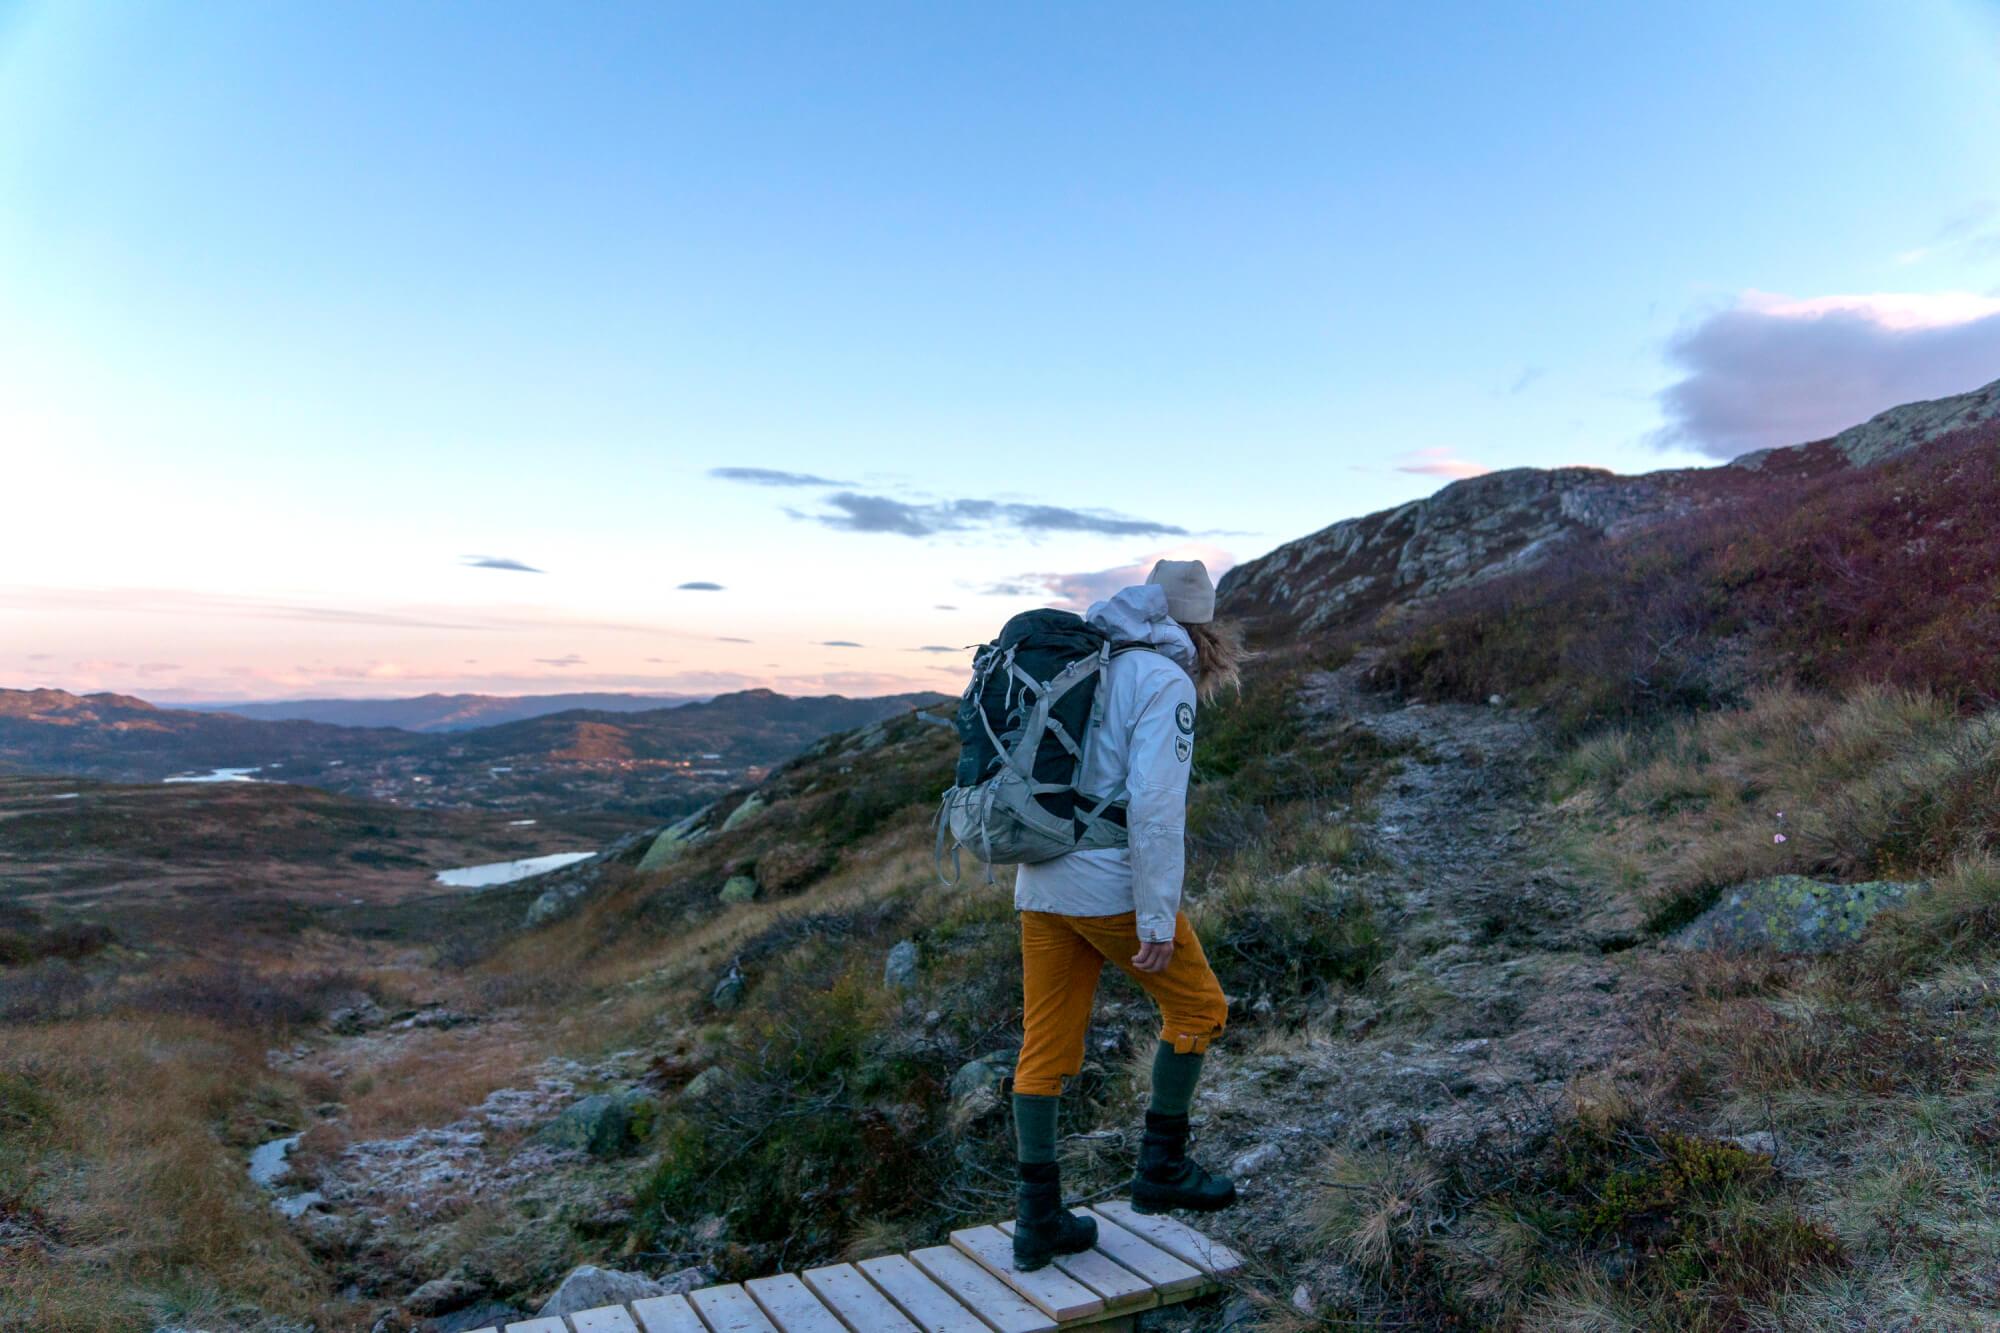 Tur i fjellet på Høgevarde